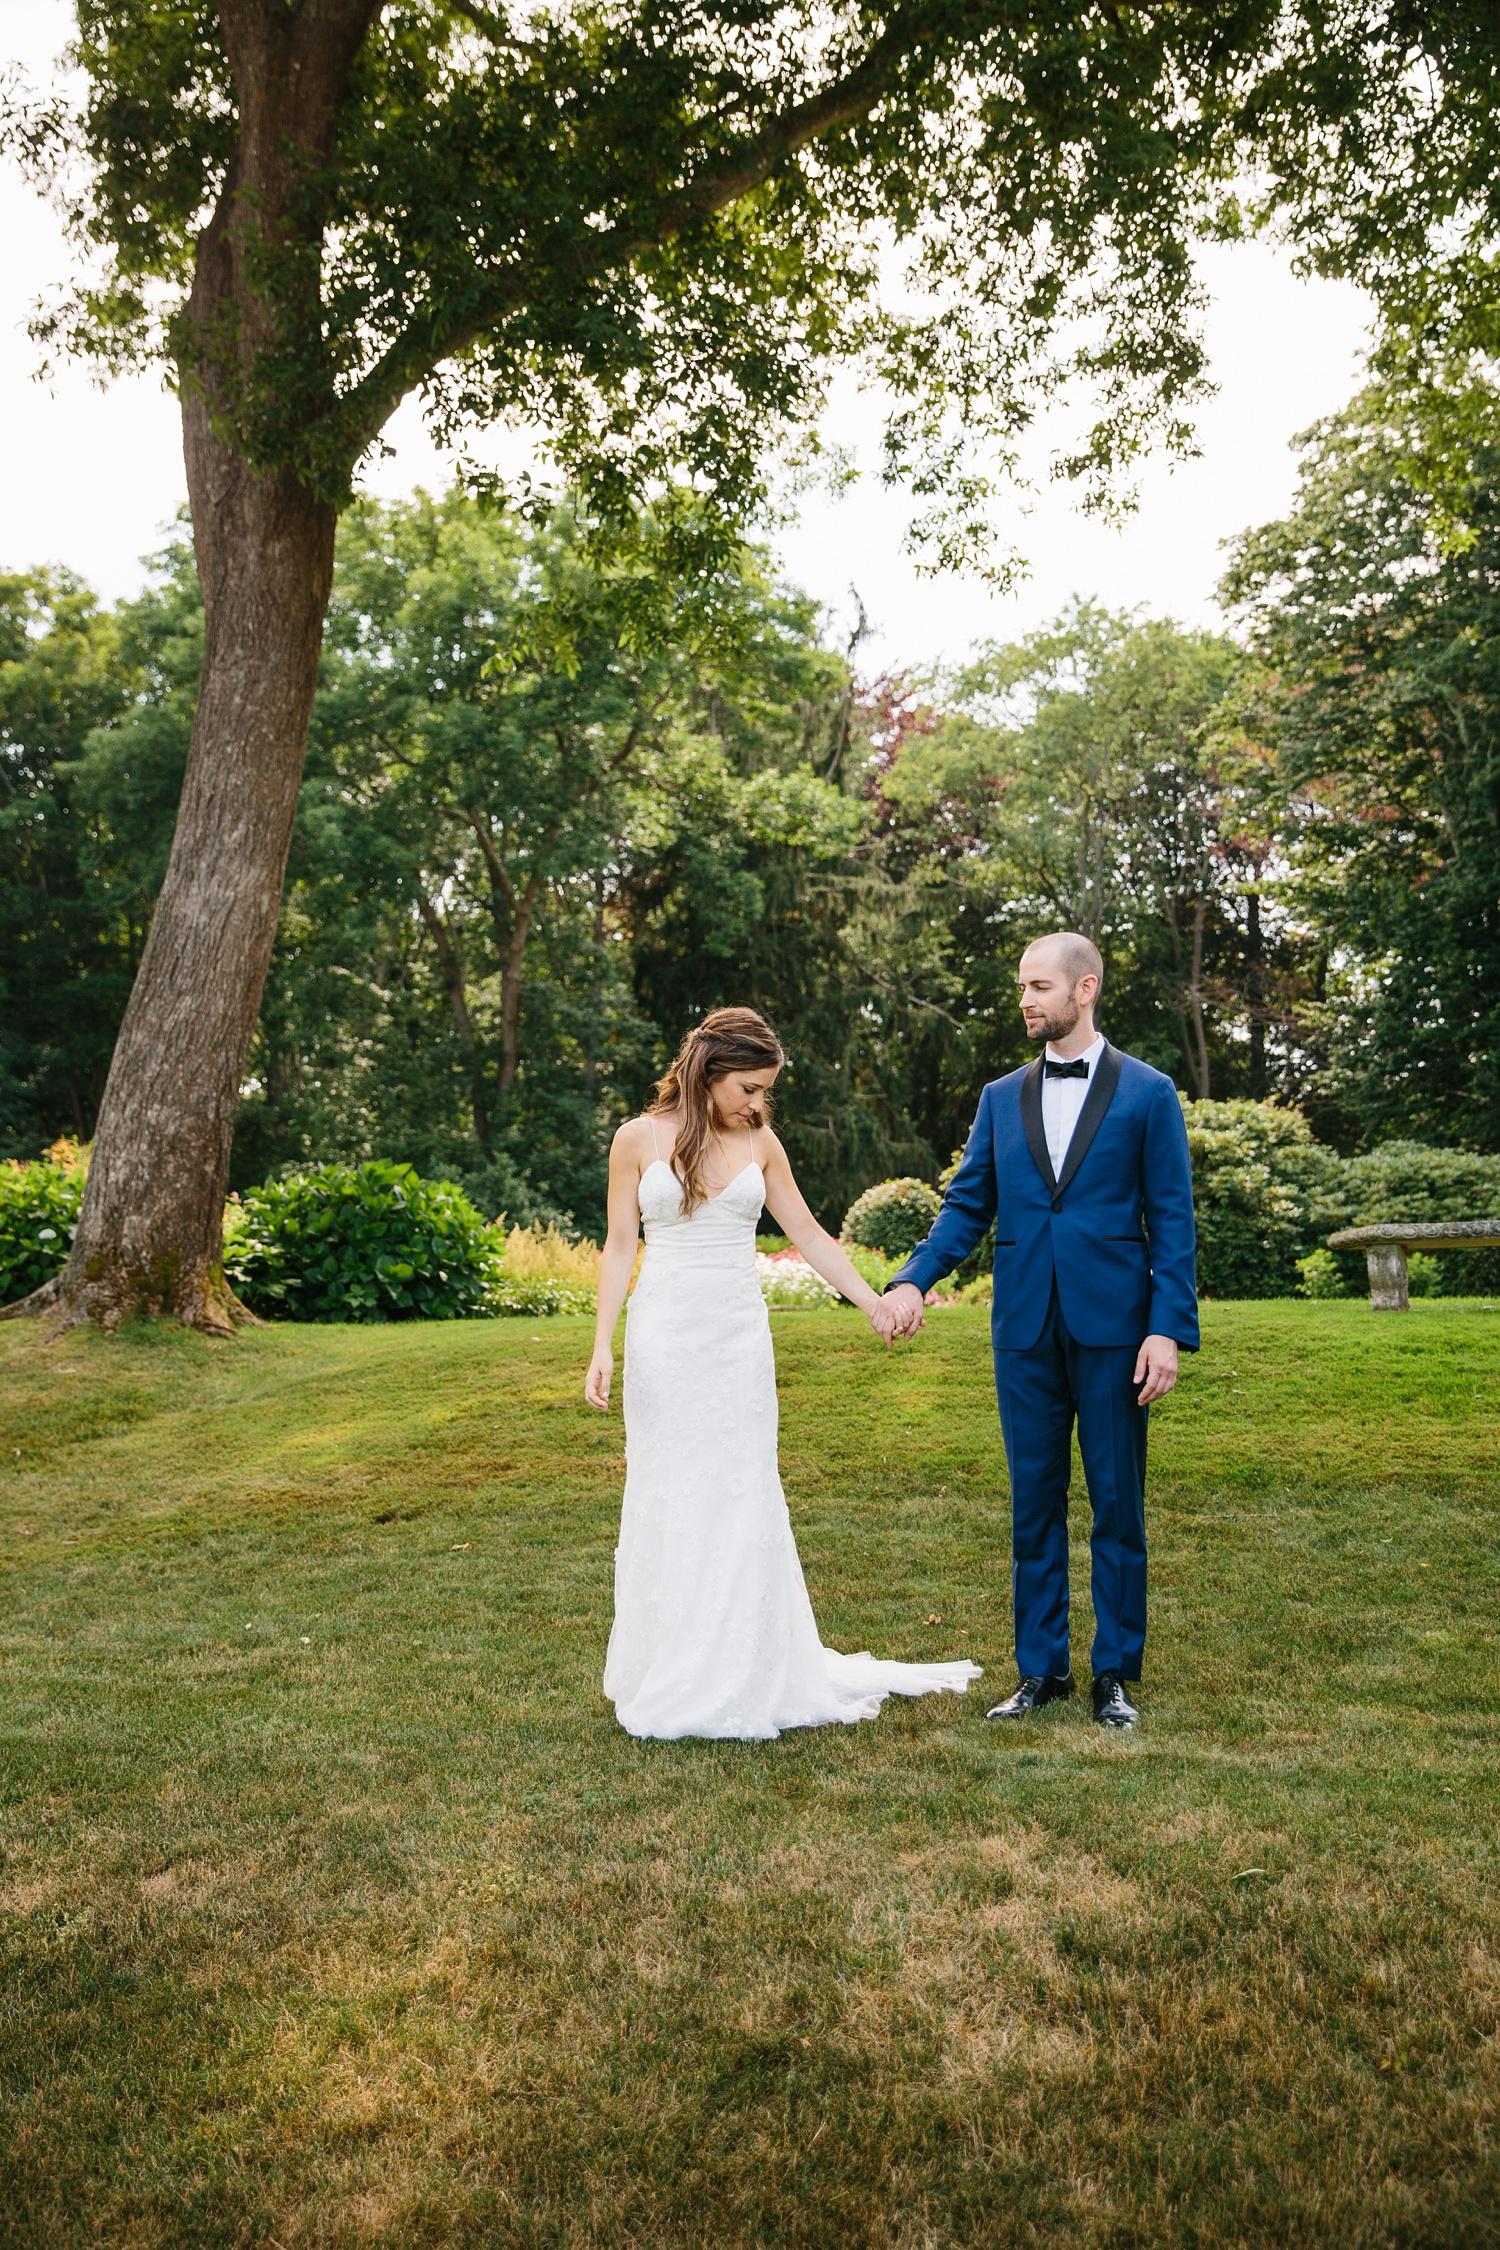 Daniel_Sarah_Glen_Manor_House_Wedding_009.jpeg